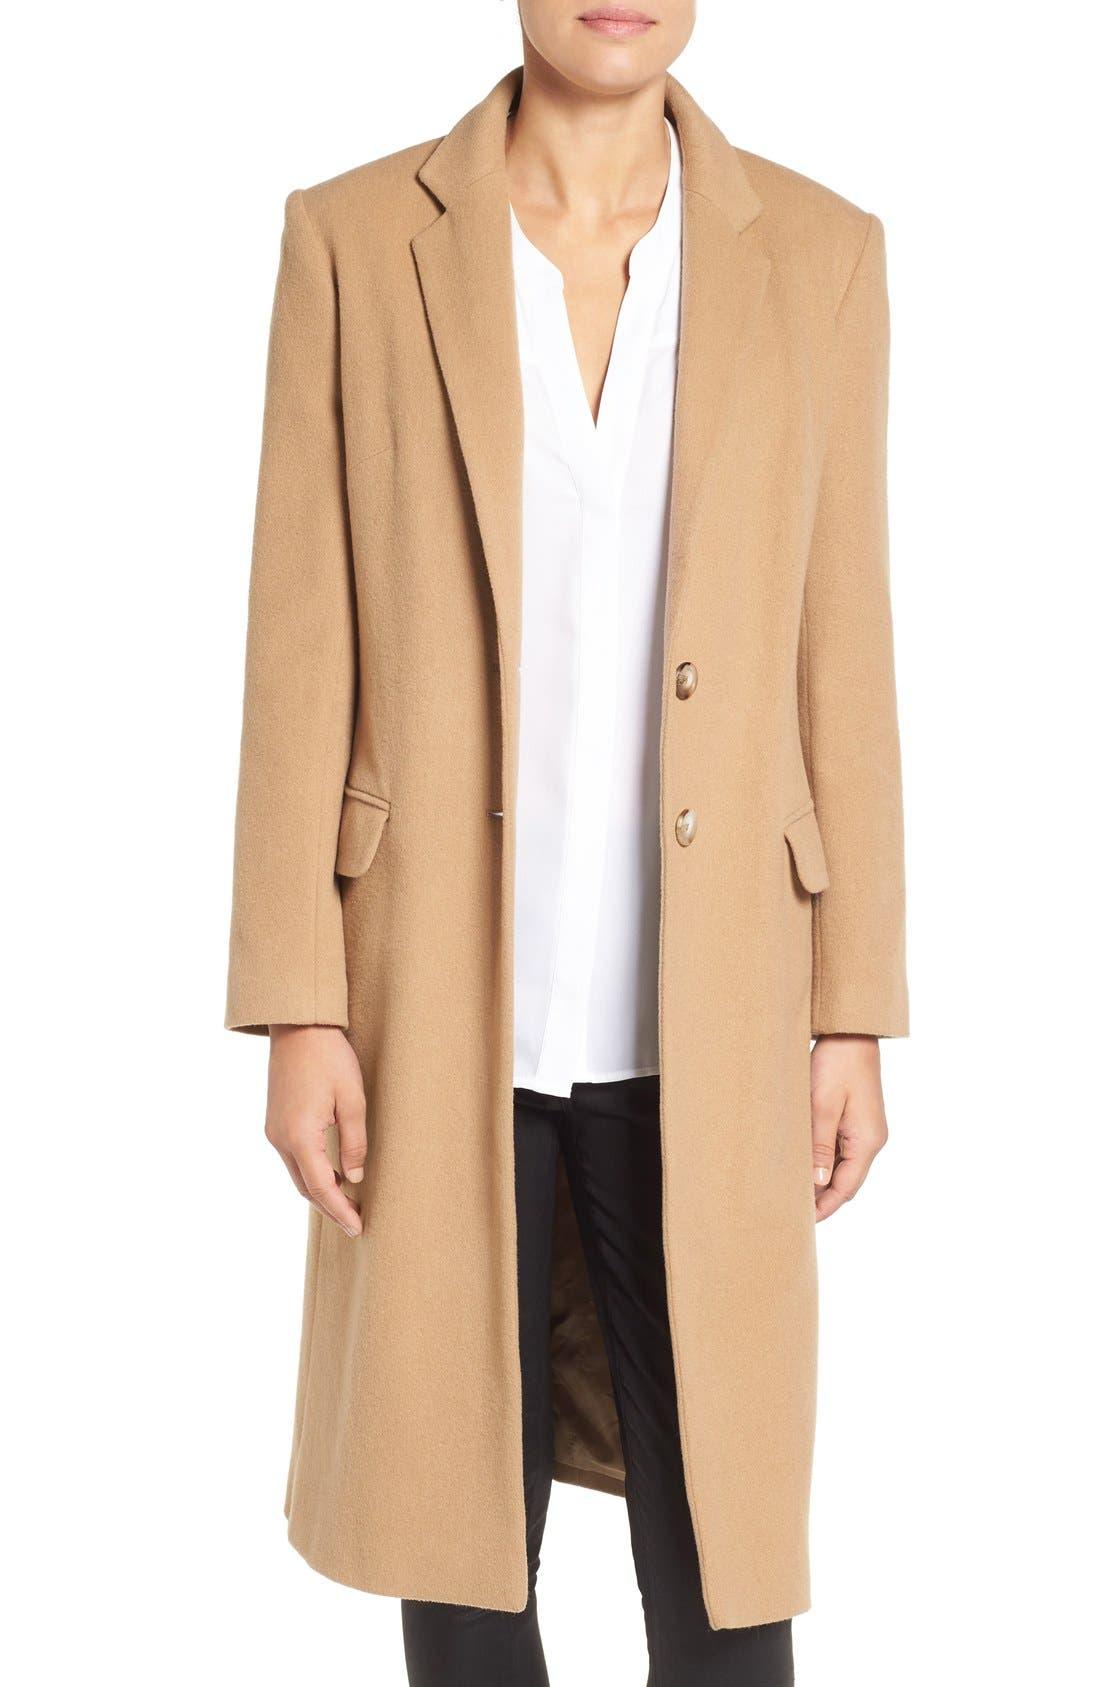 Helene Berman Wool Blend College Coat